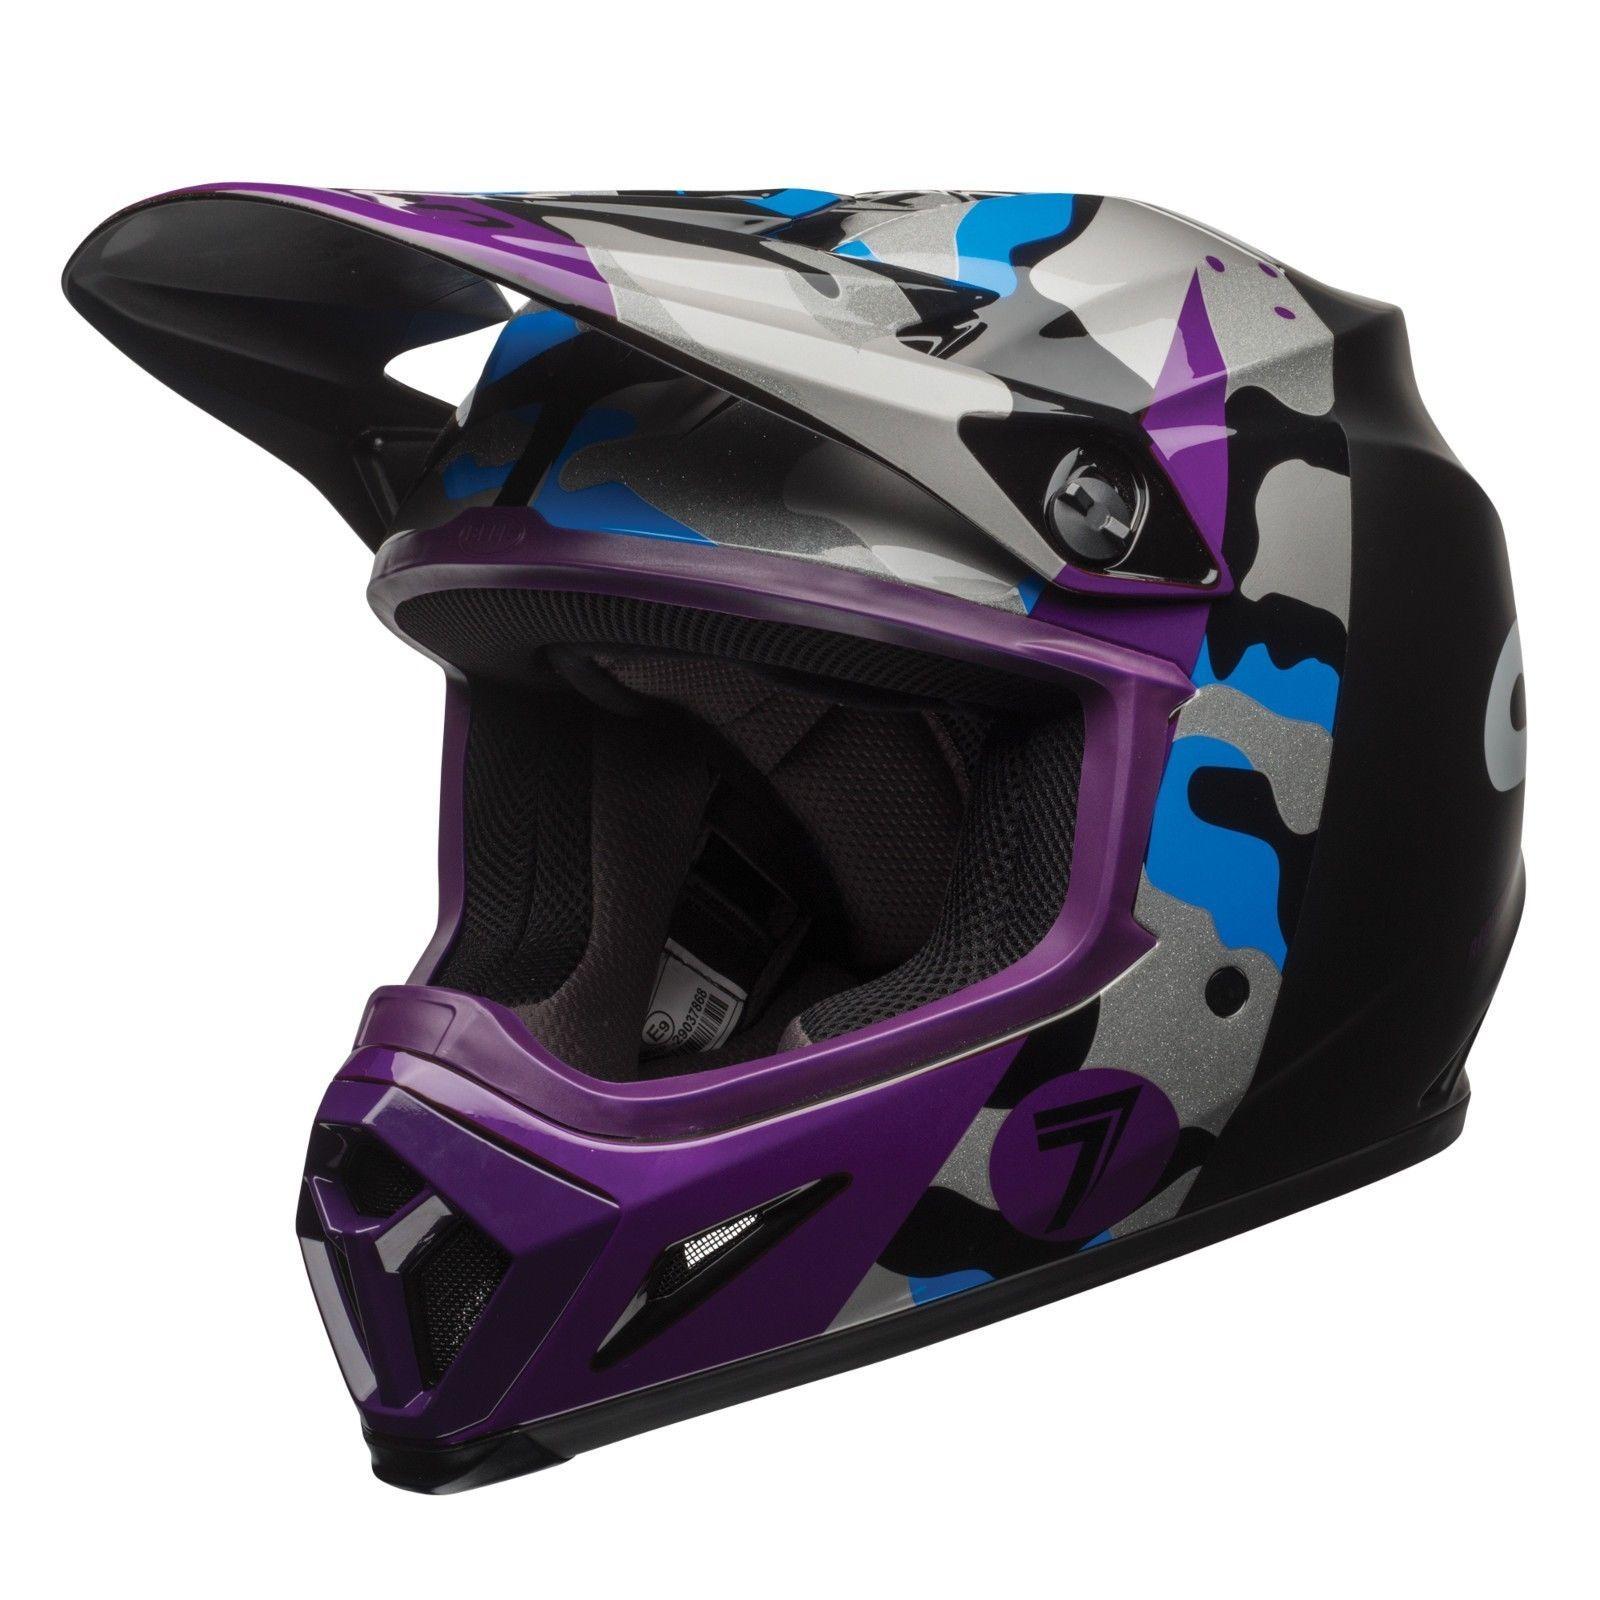 Bell 17 Ece Seven M9 Mips Soldier Matte Purple Blue Mx Helmet Dirt Bike Off Road Helmet Dirt Bike Bell Helmet